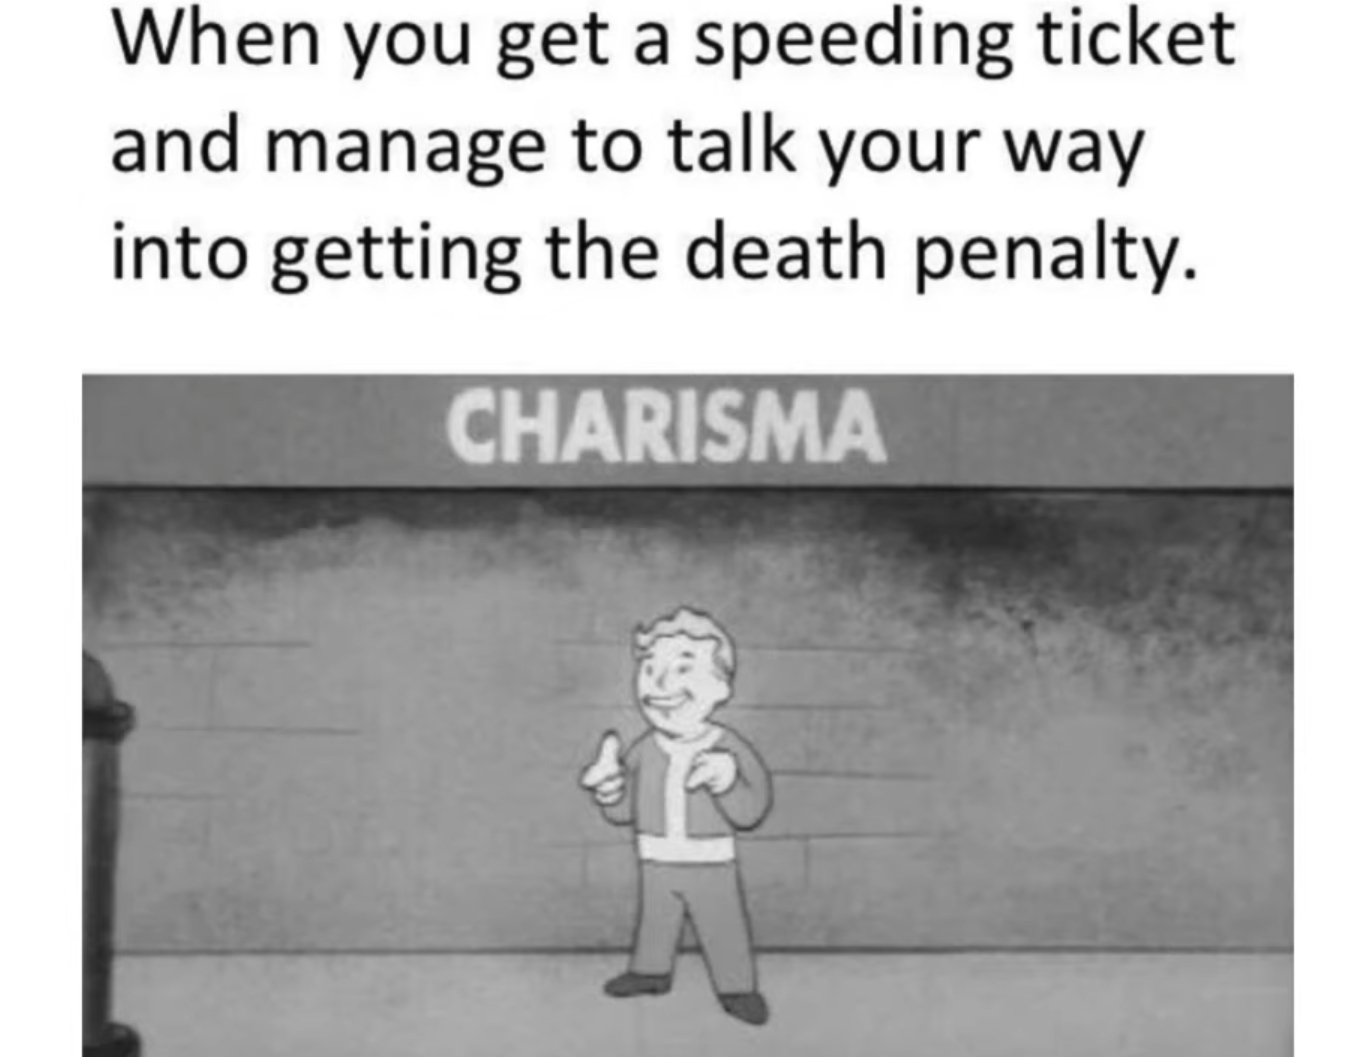 Charisma 10 - meme